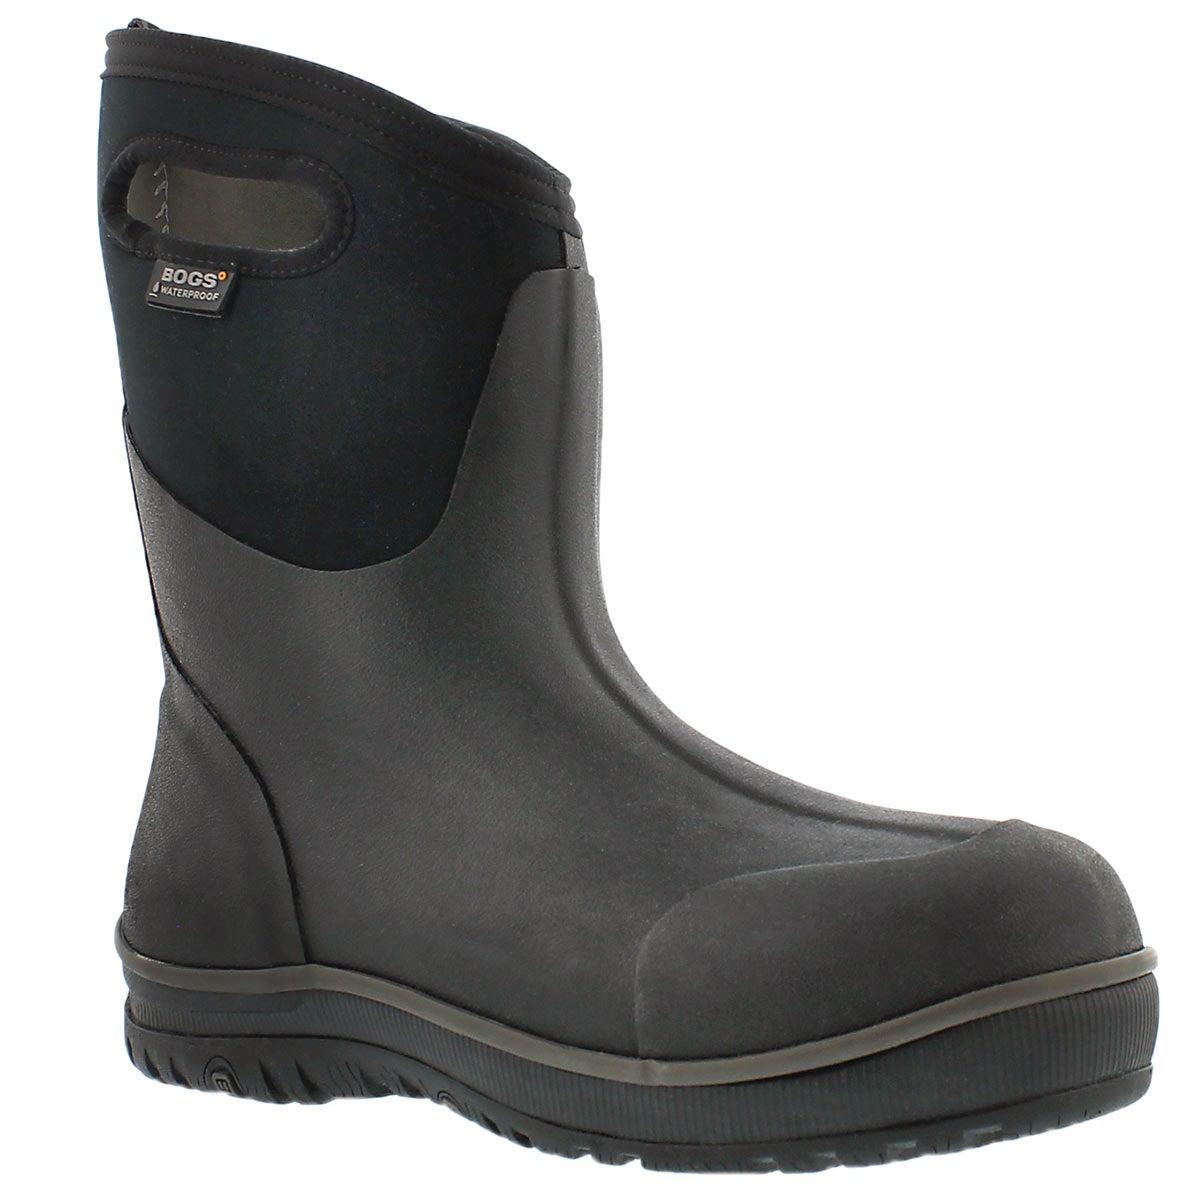 Men's ULTRA MID black waterproof boots